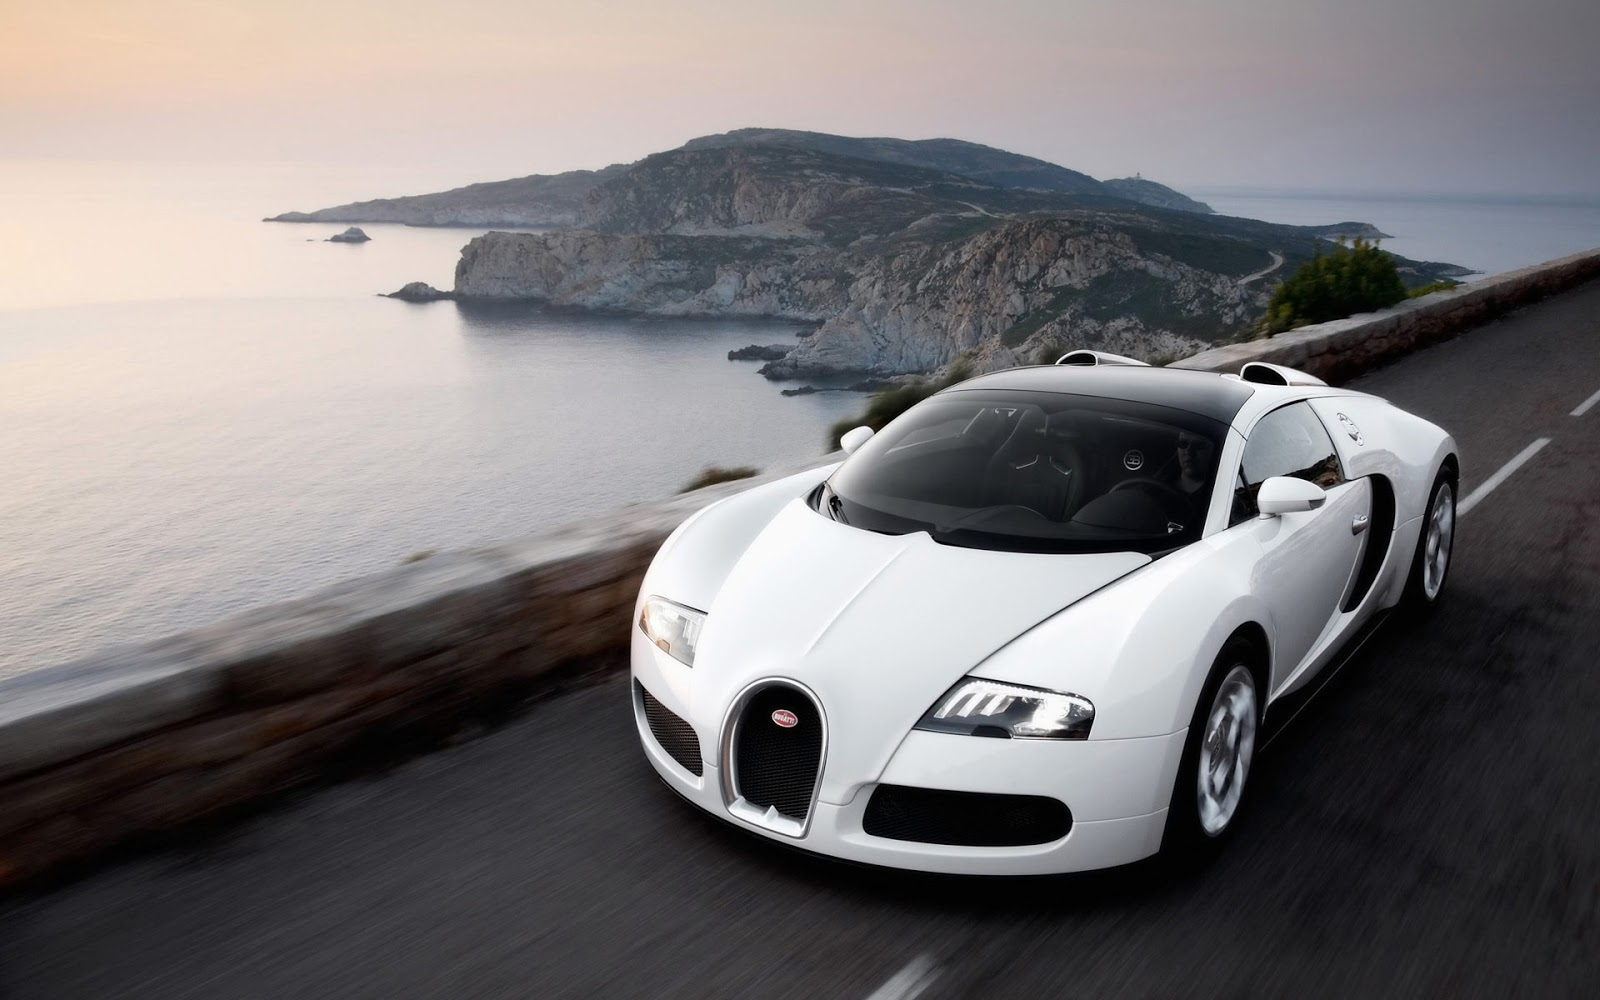 Bugatti Veyron Super Sport Wallpaper Hd: Bugatti Veyron Super Sport 2013